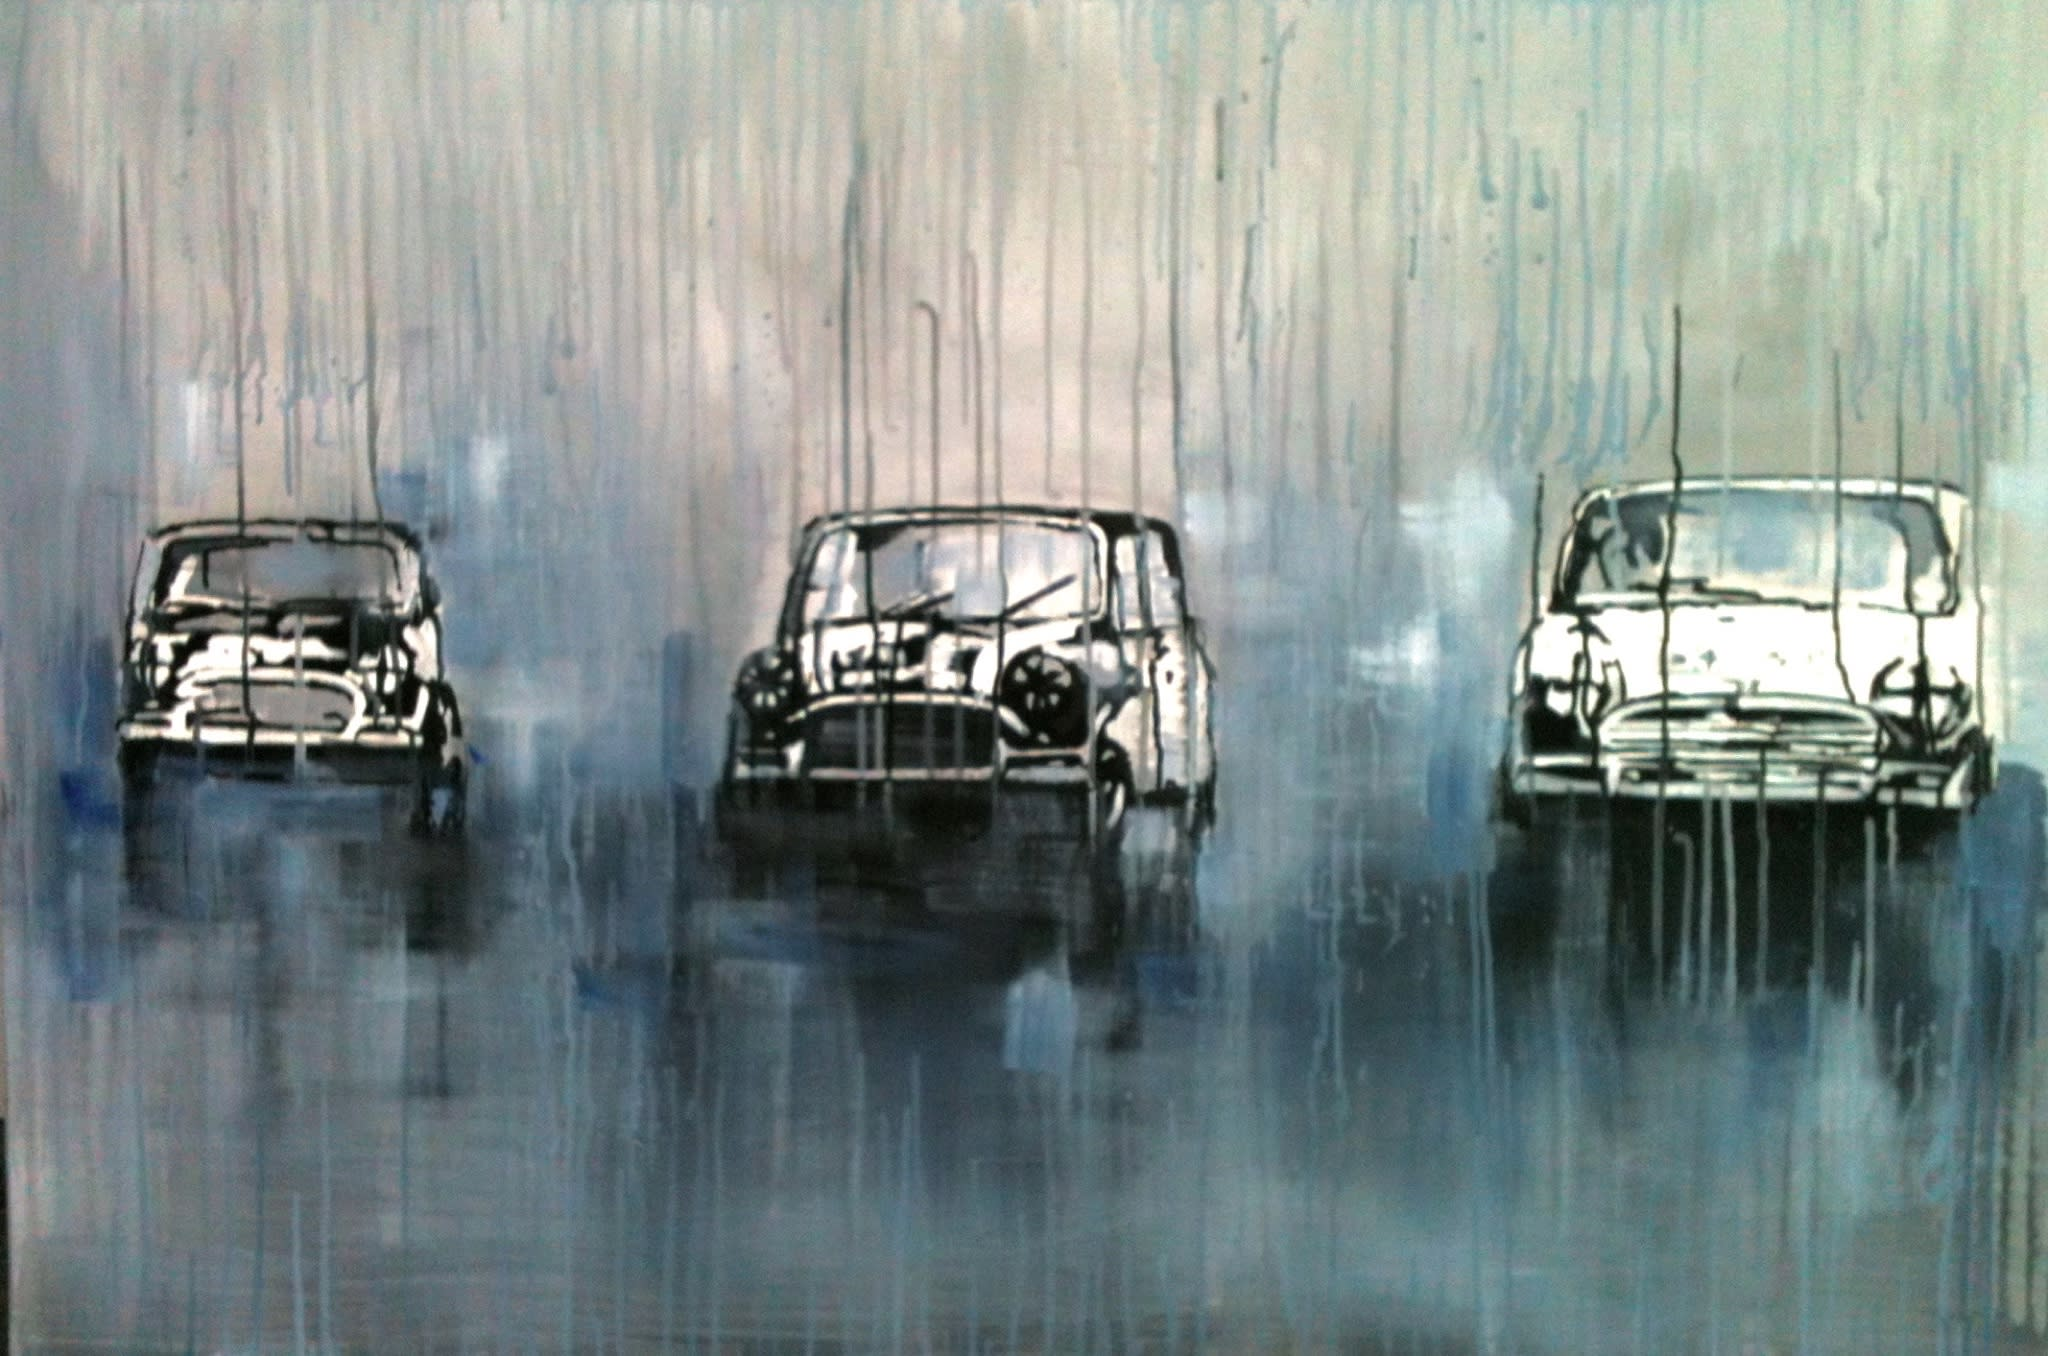 Minis racing in the rain by steph fonteyn gknxjm